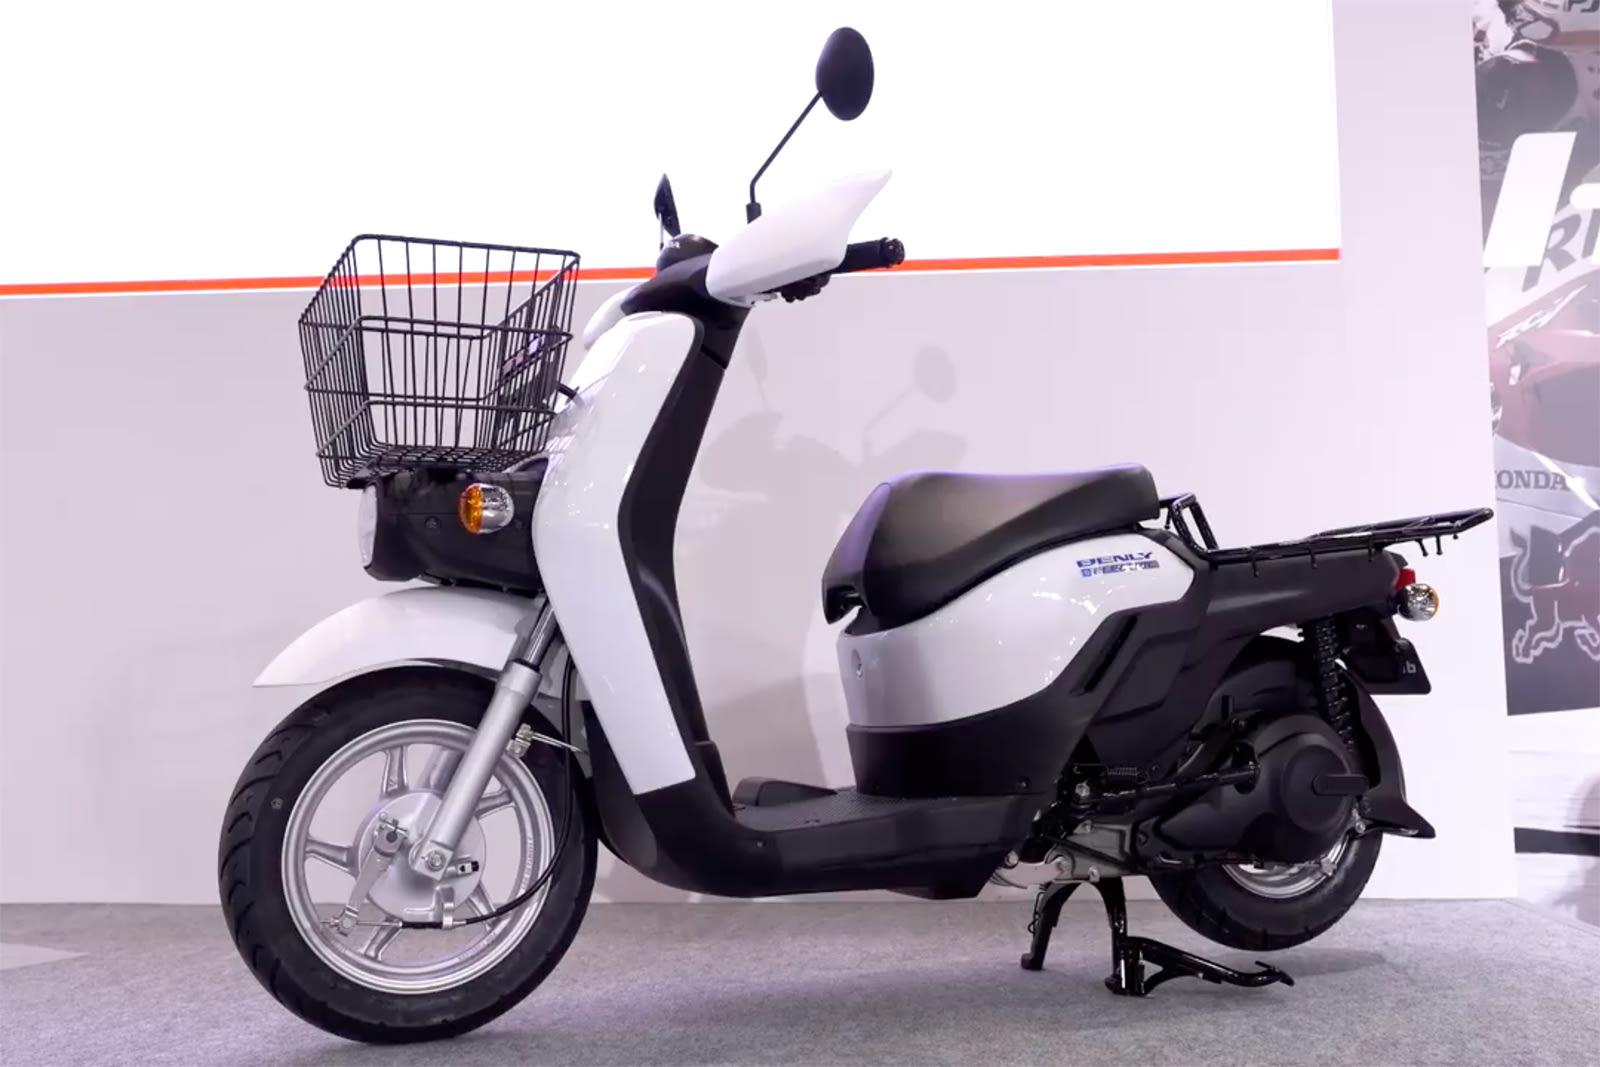 Honda Benly Electric scooter prototype